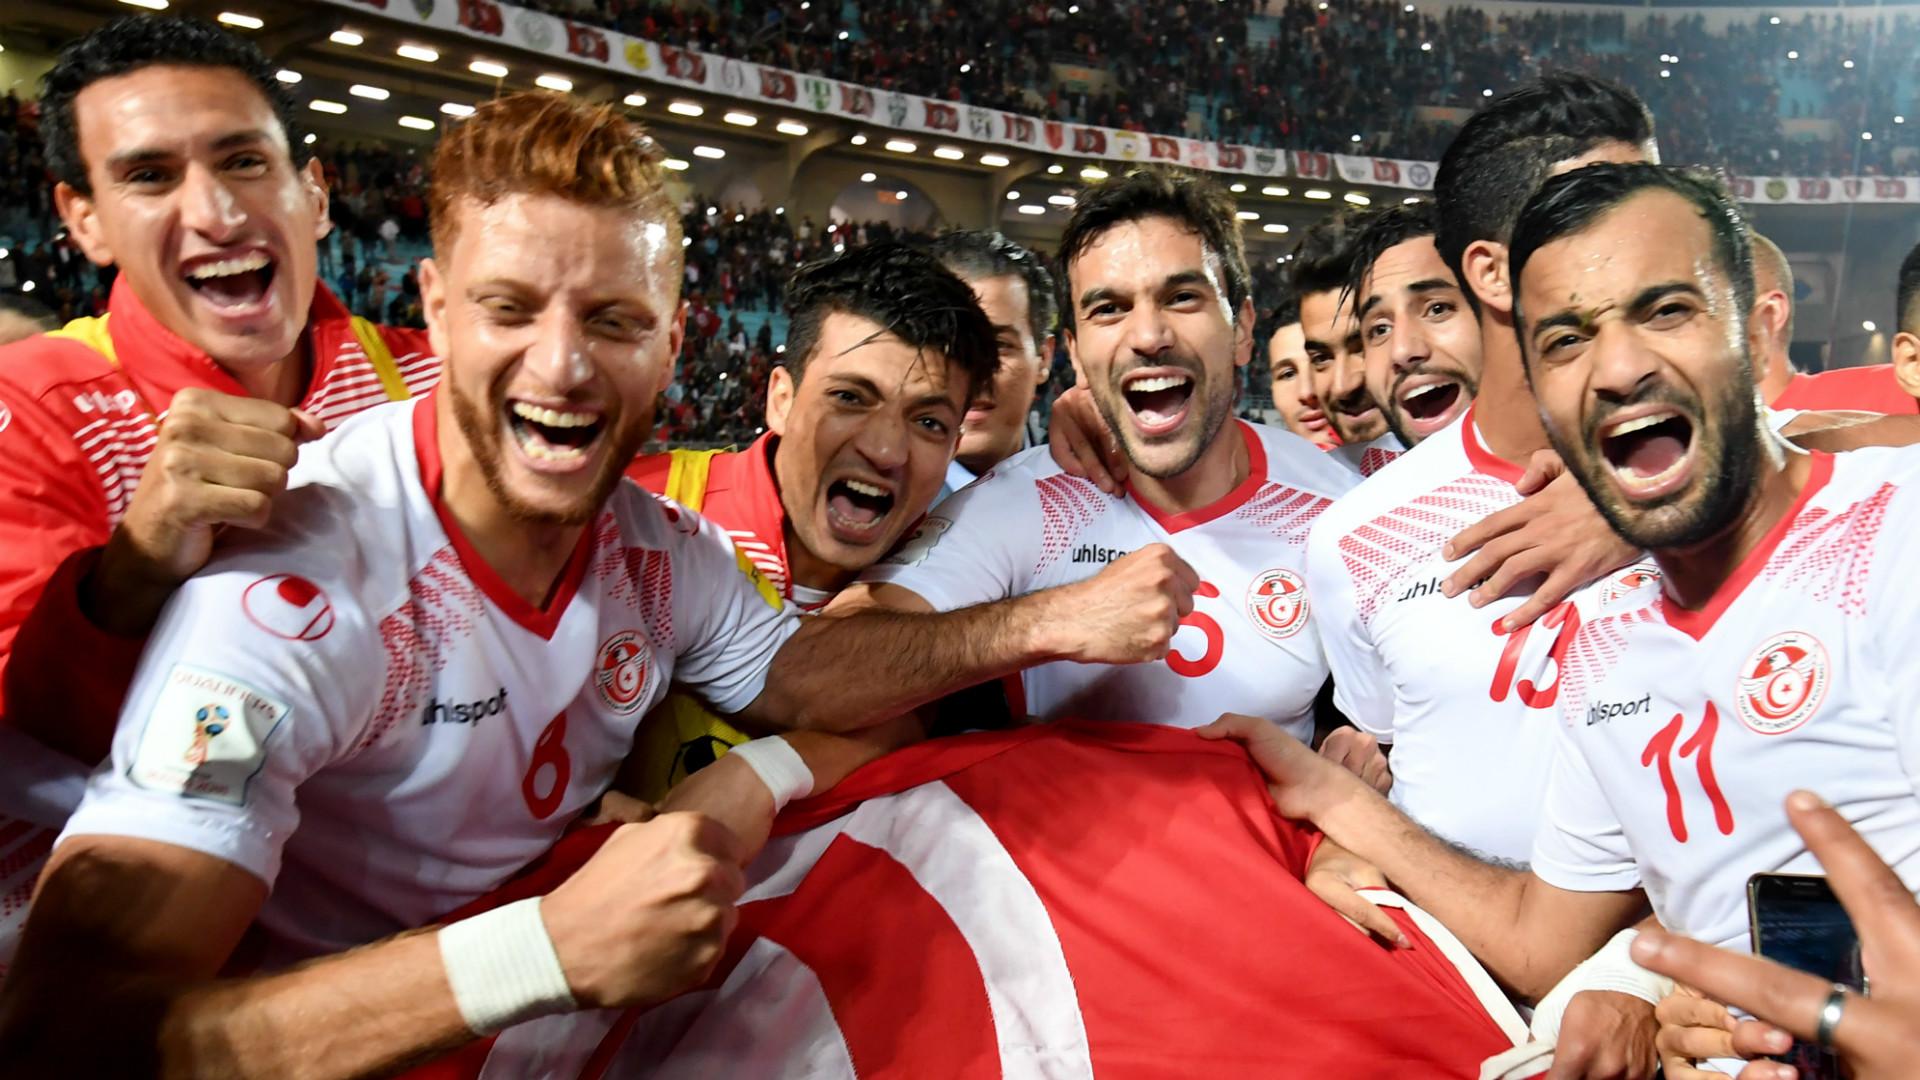 Fifa tunisian players fifa u17 world cup 2018